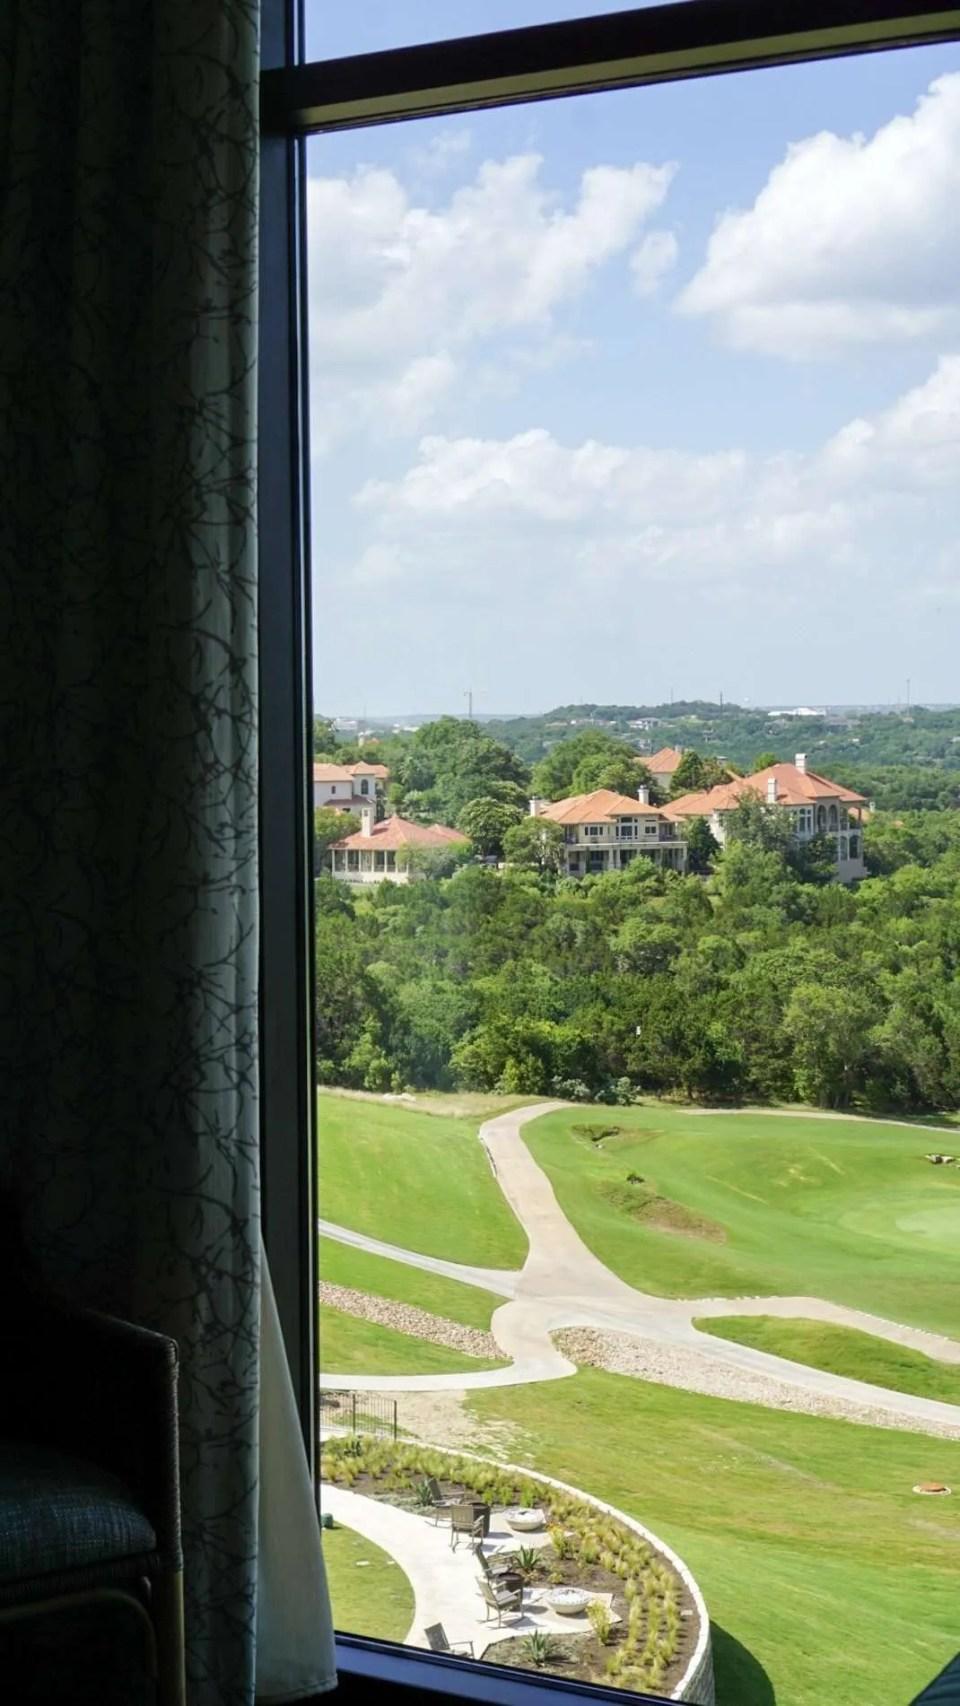 golf course at the Omni Barton Creek Resort & Spa in Austin